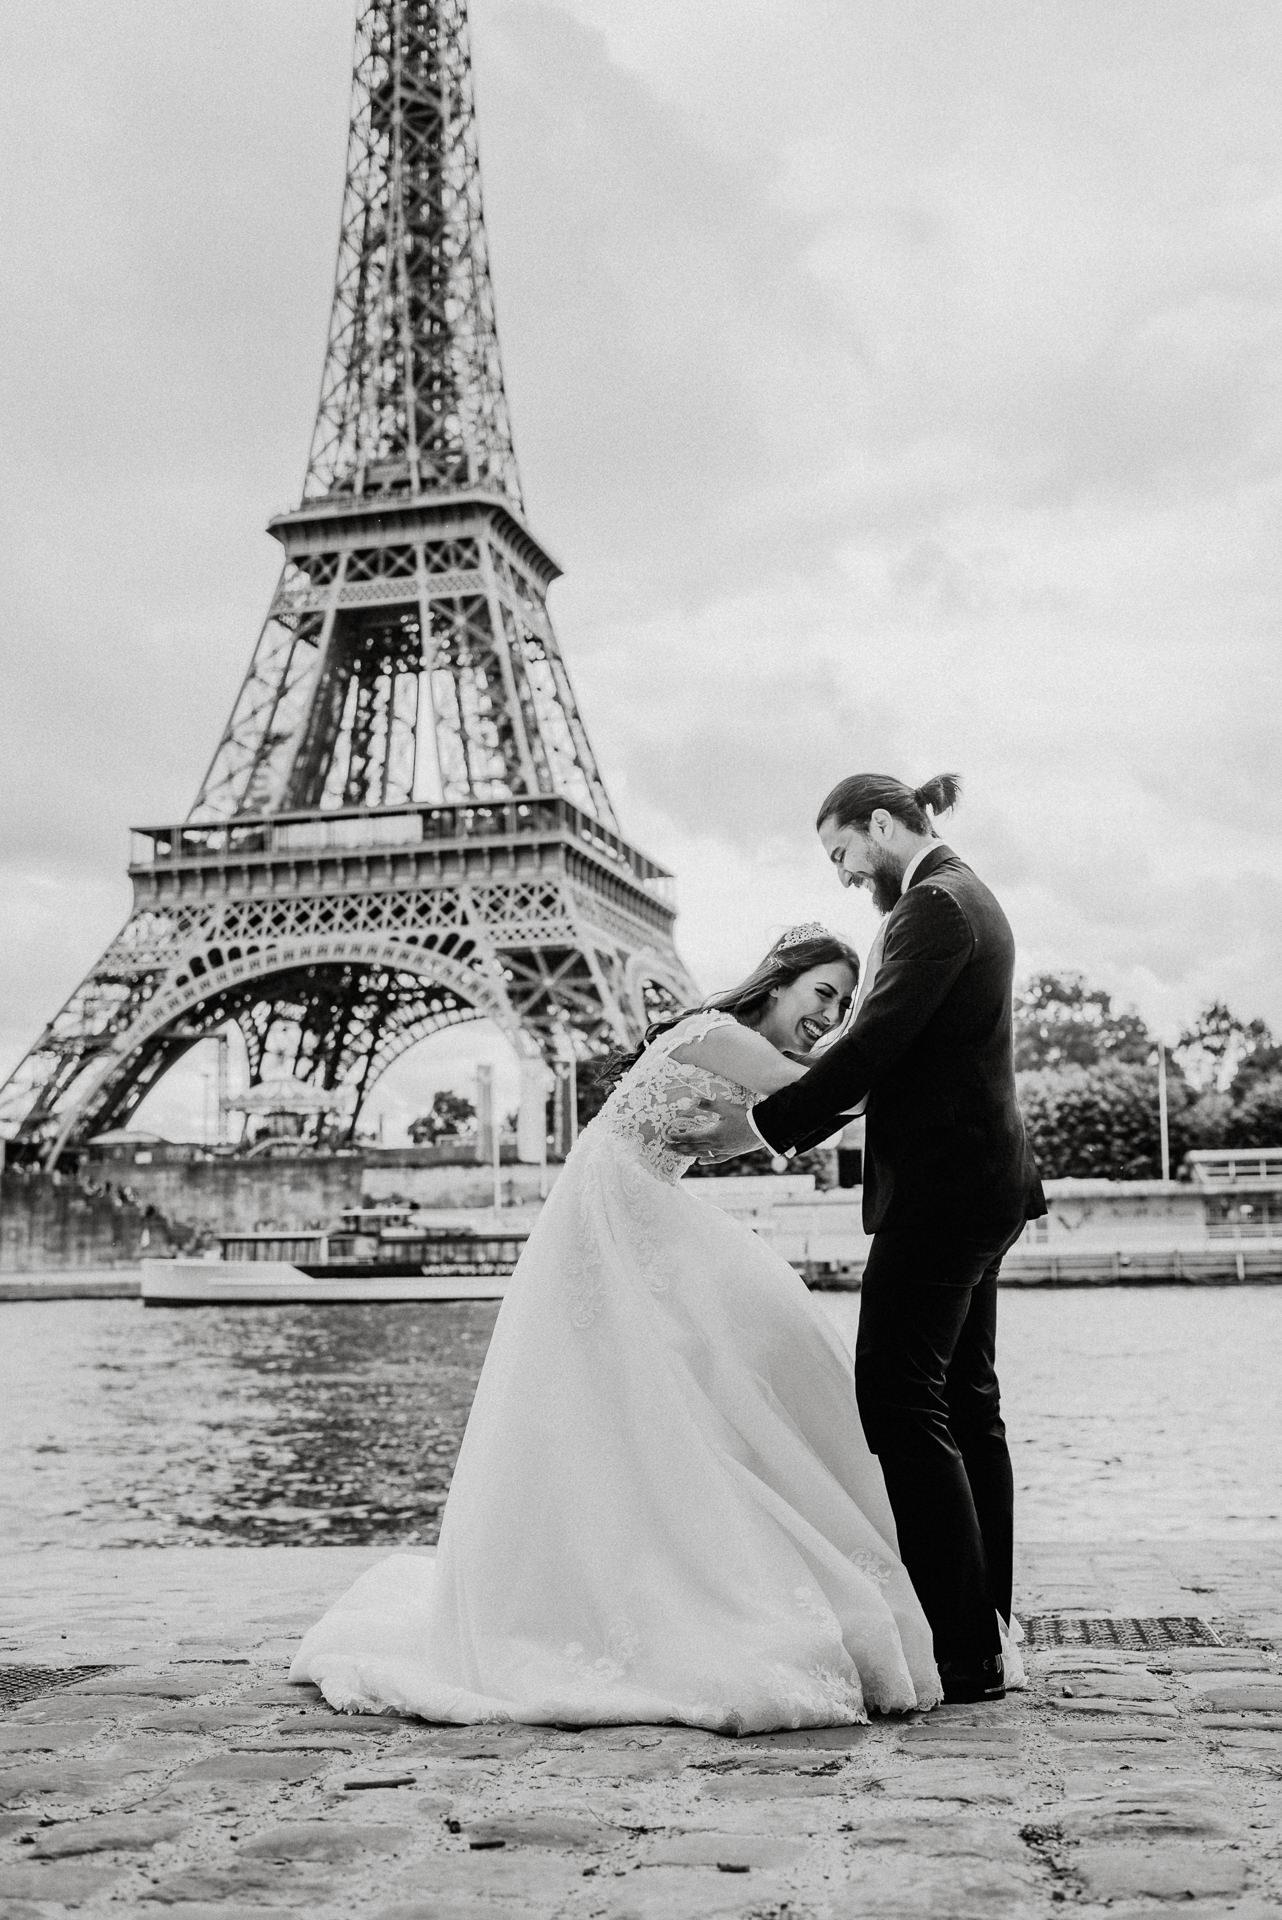 Eiffel tower wedding proposal photo shoot